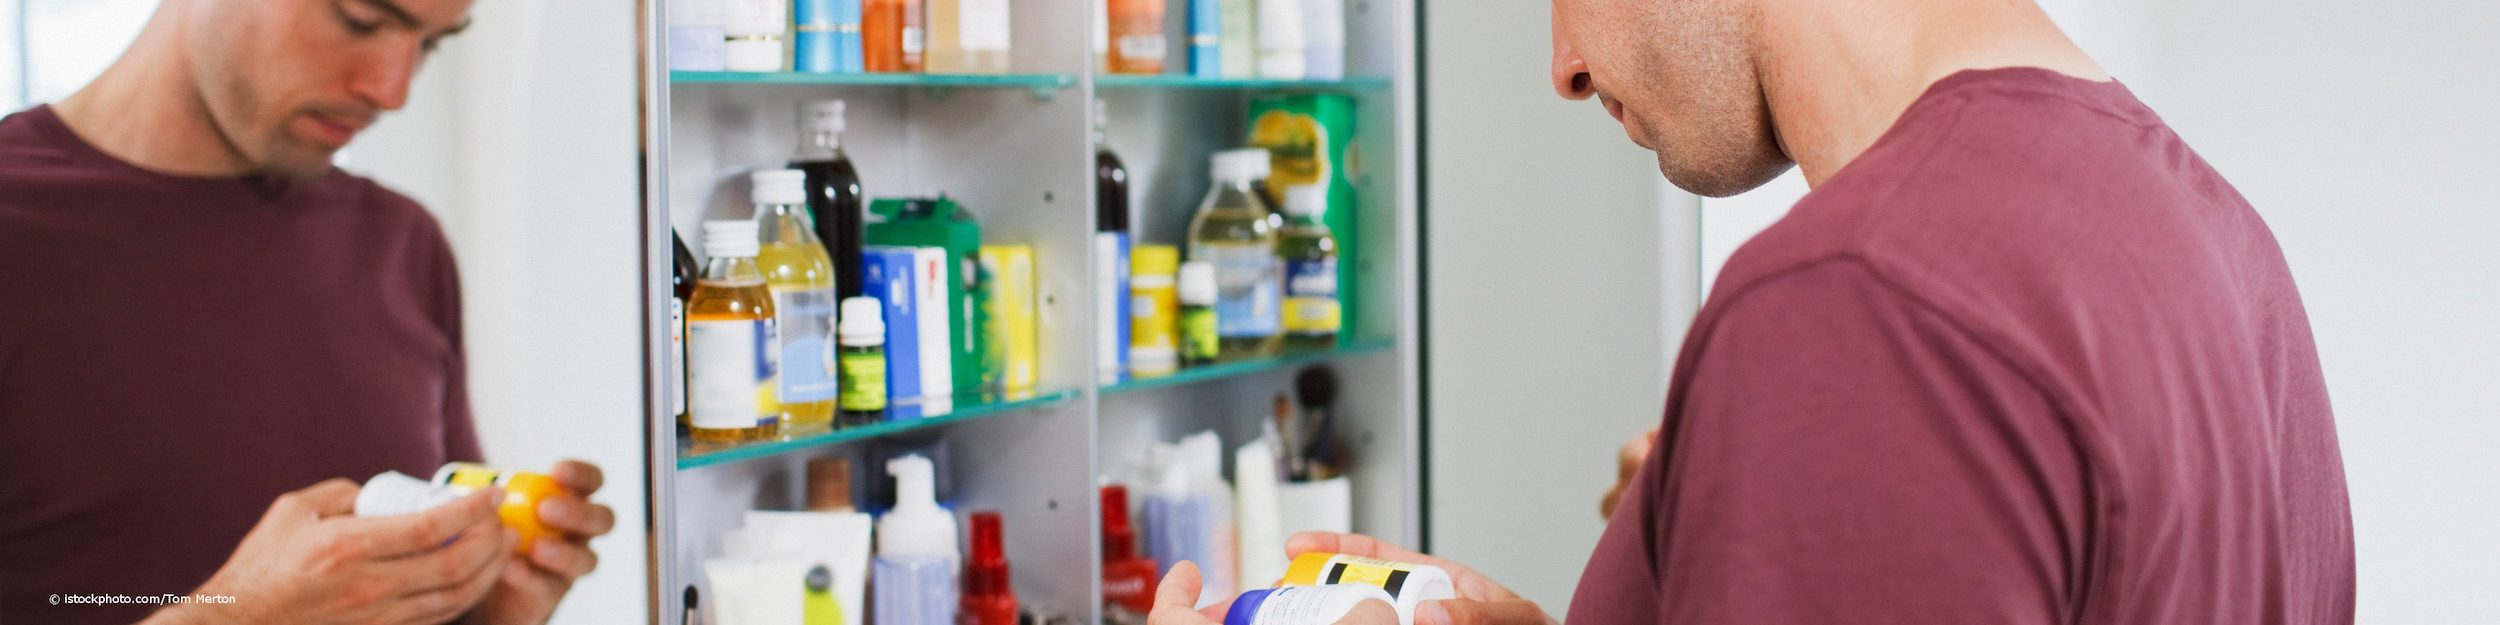 Mann kontrolliert seinen Medizinschrank.